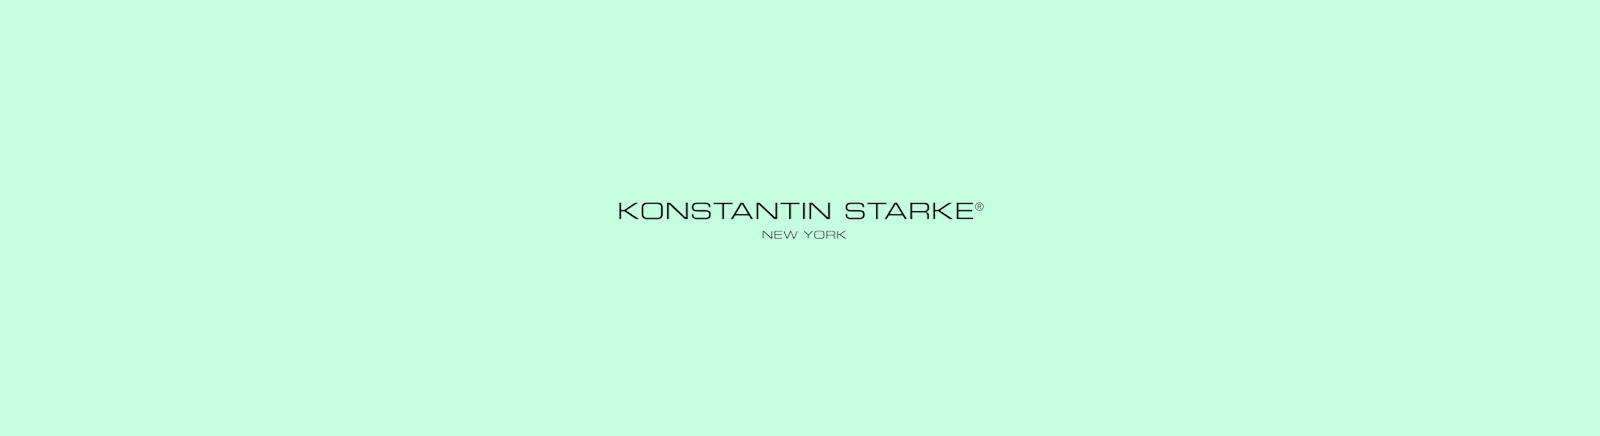 Prange: Konstantin Starke Ballerinas online kaufen online shoppen